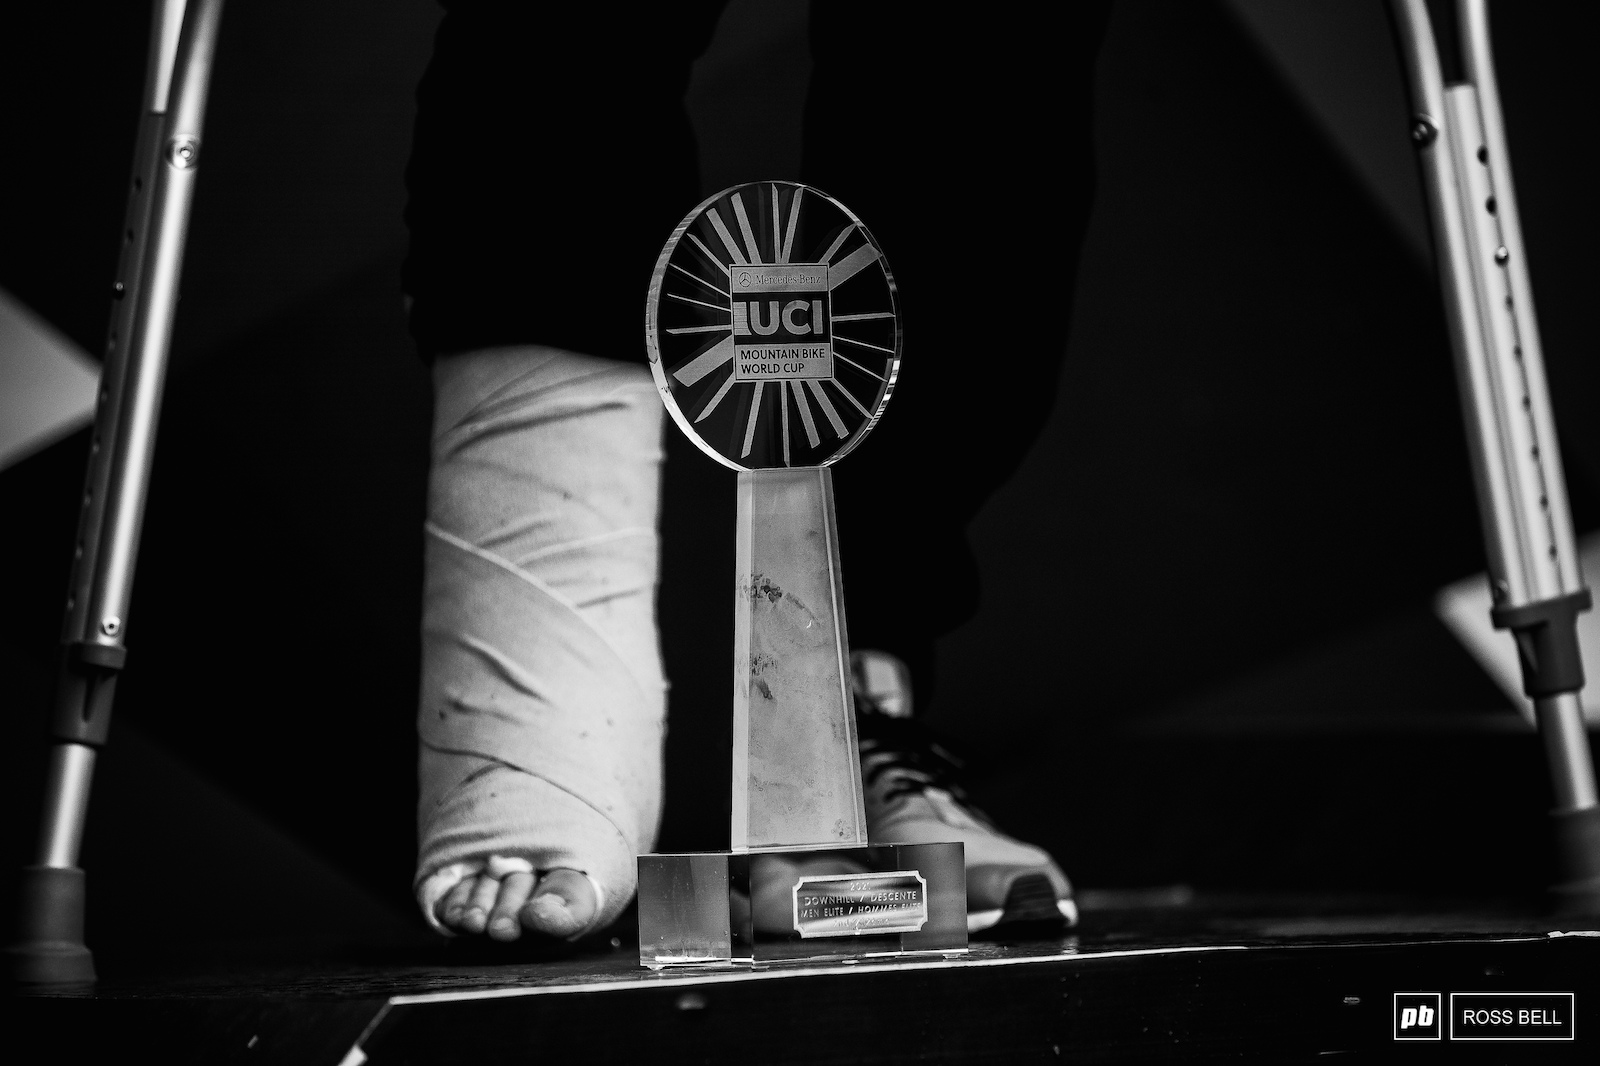 Thibaut Daprela made it up on to the overall podium despite his broken foot.